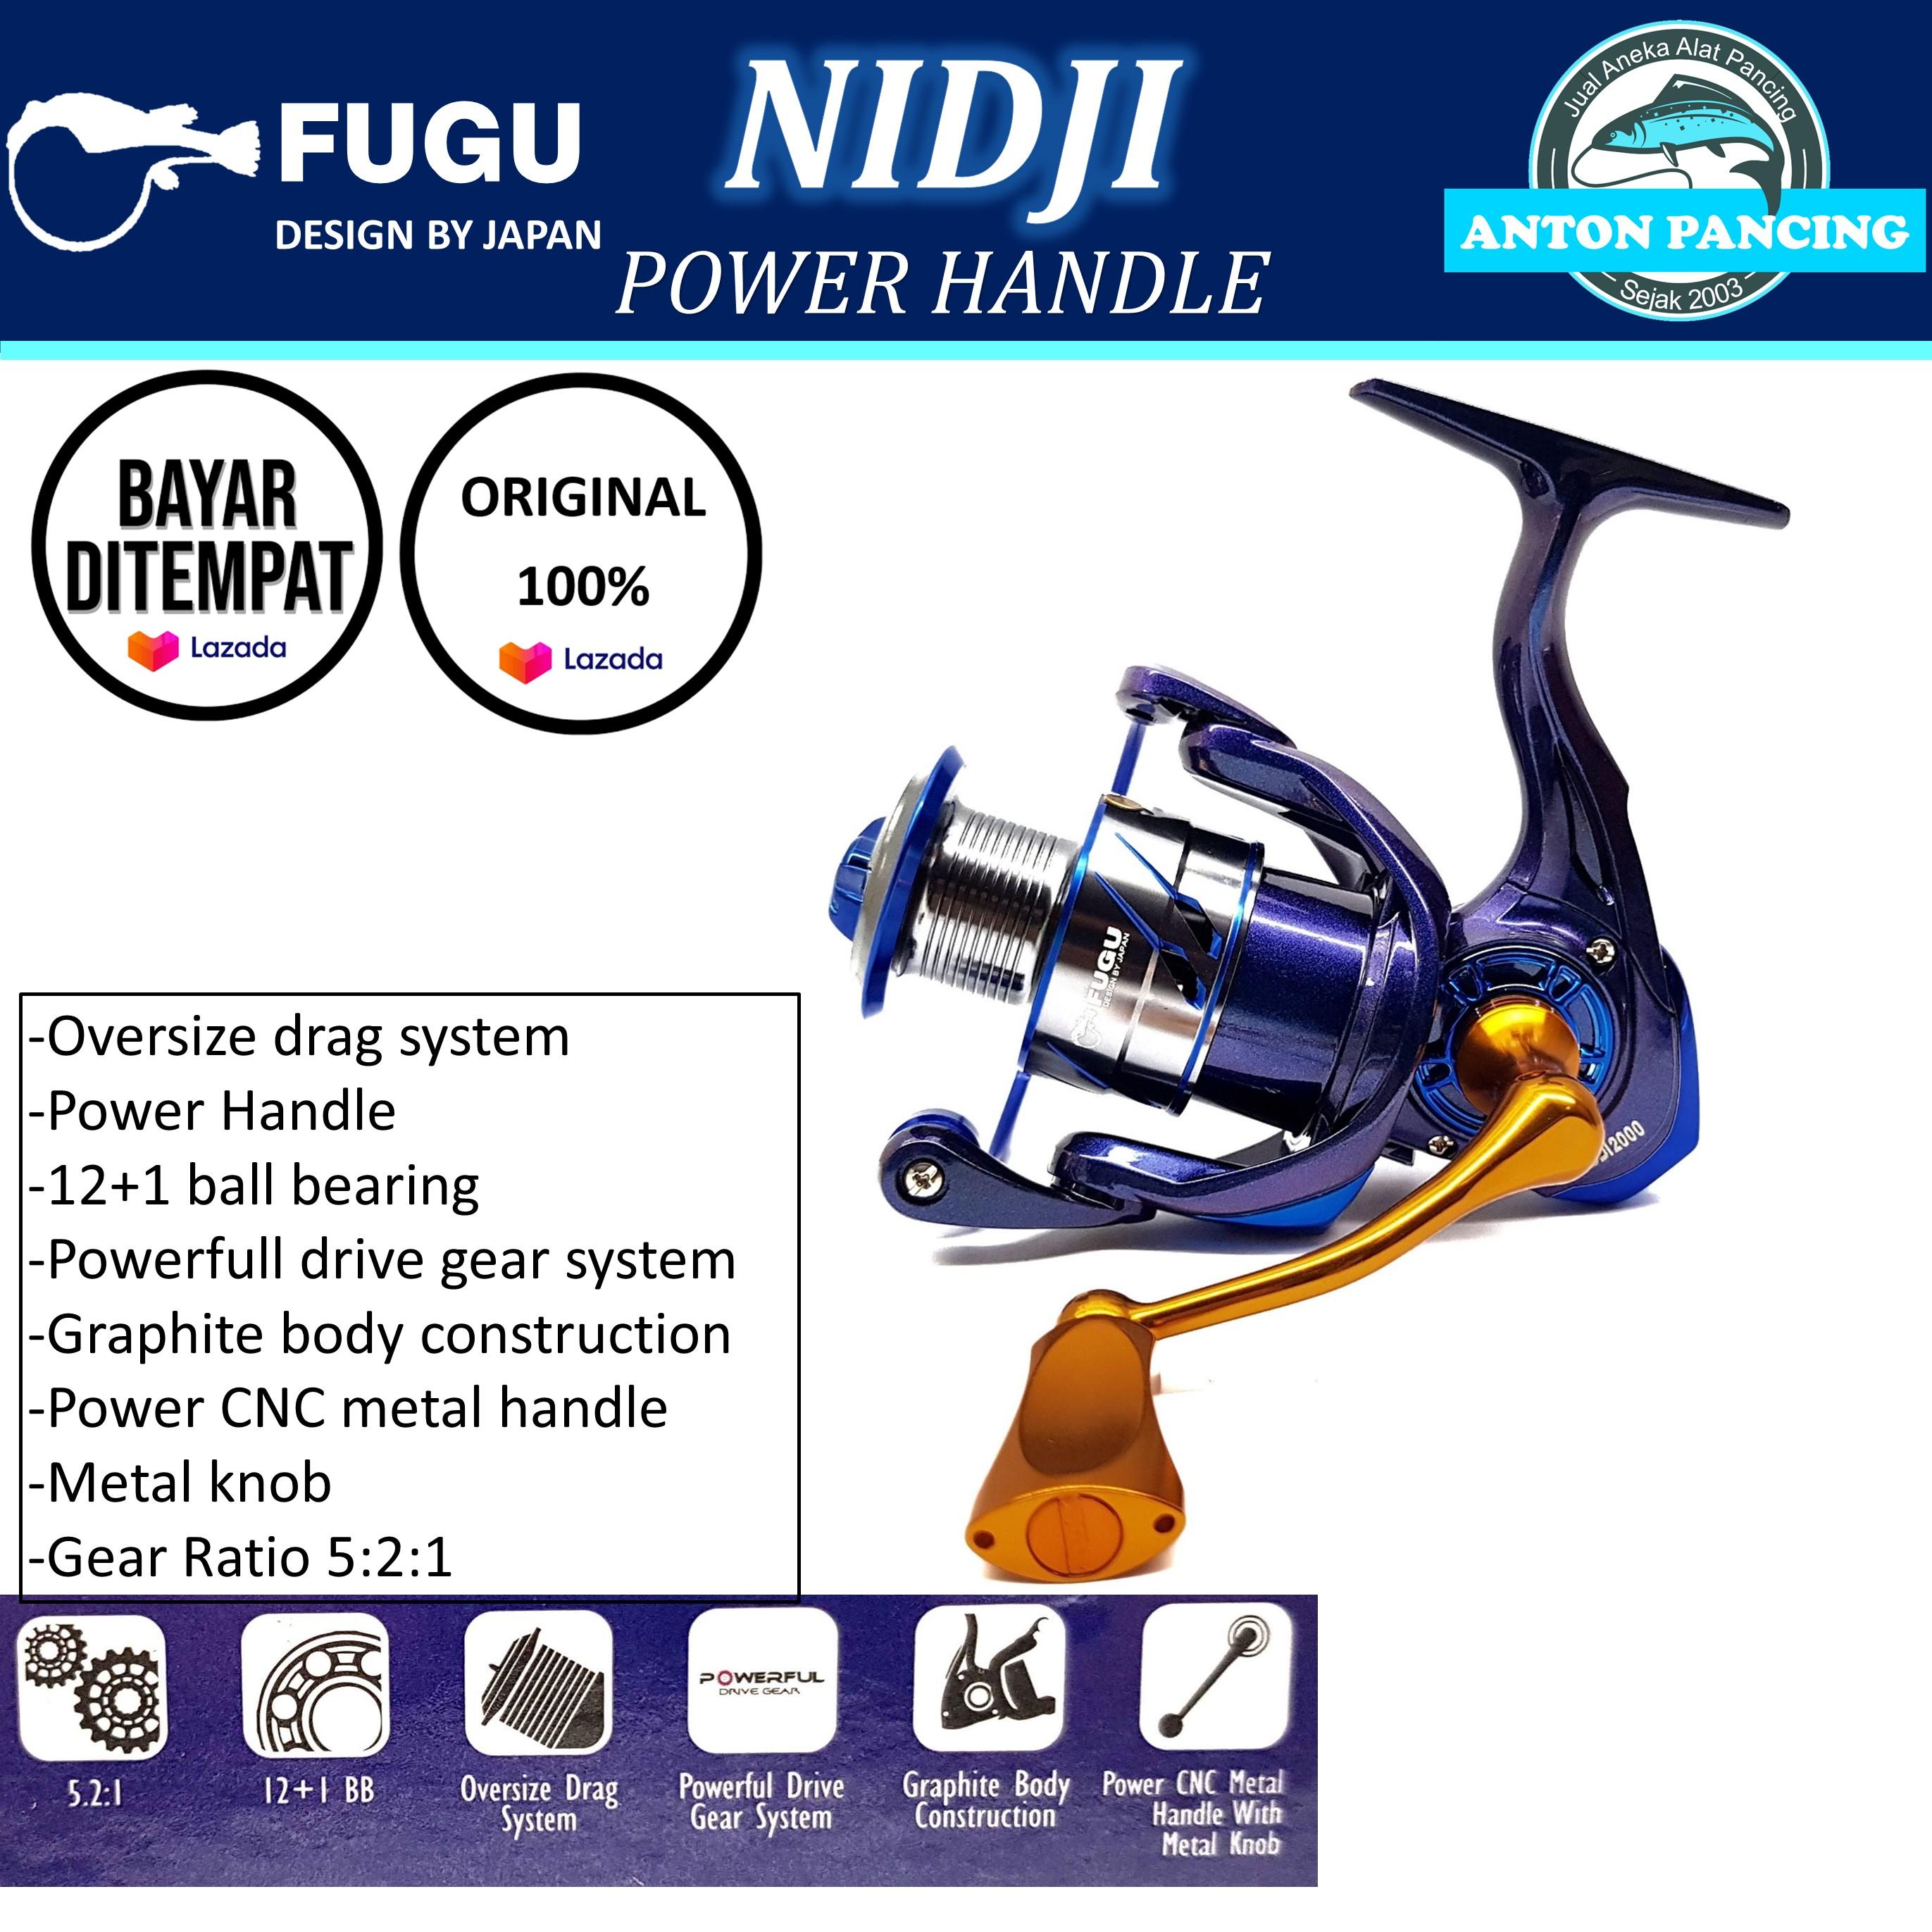 reel pancing fugu nidji 100020003000 power handle